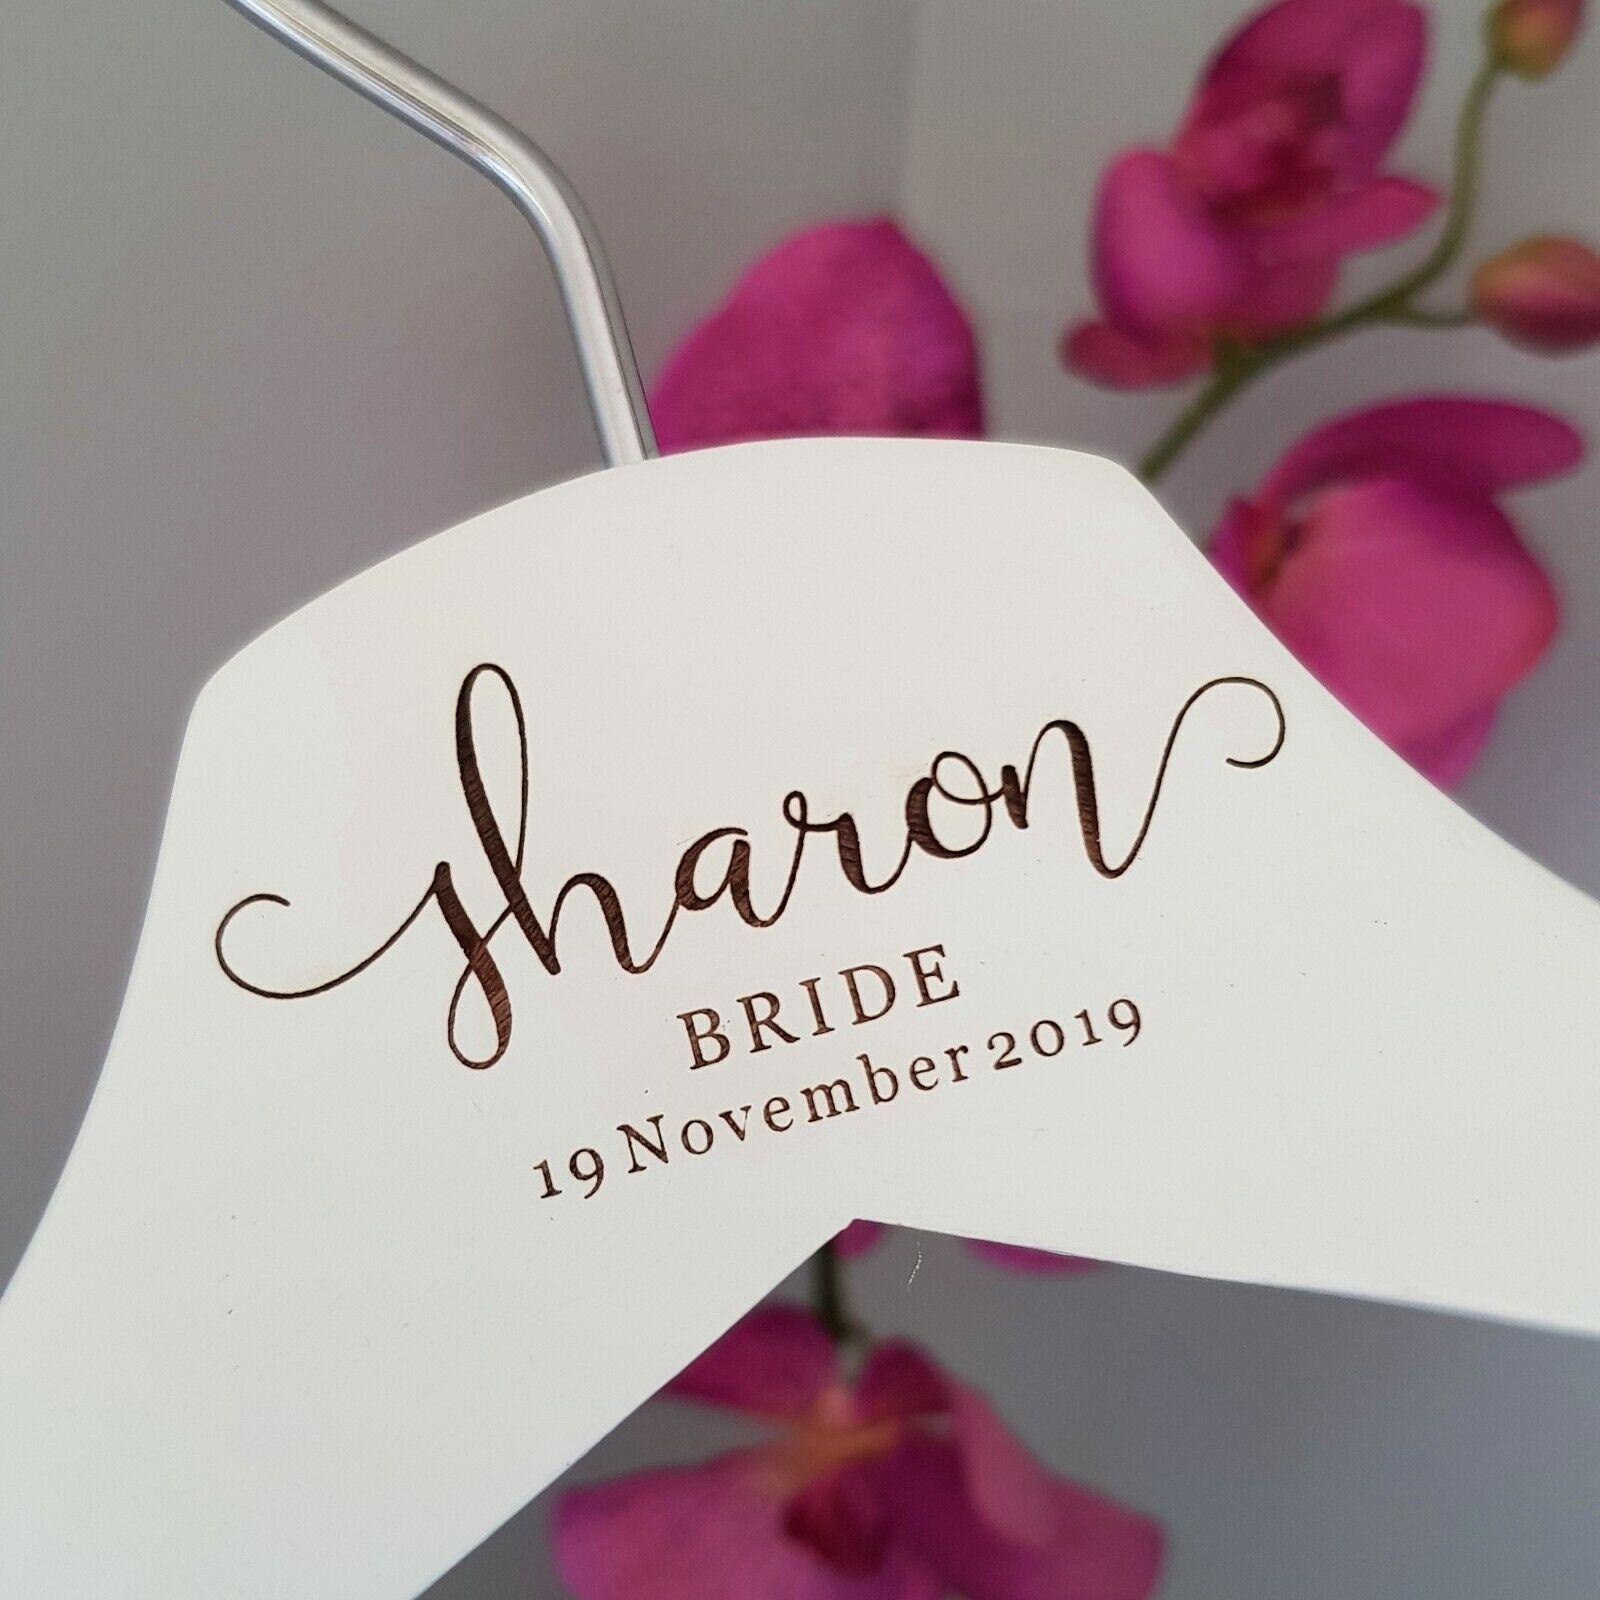 White Bridal Personalised Coat-hanger